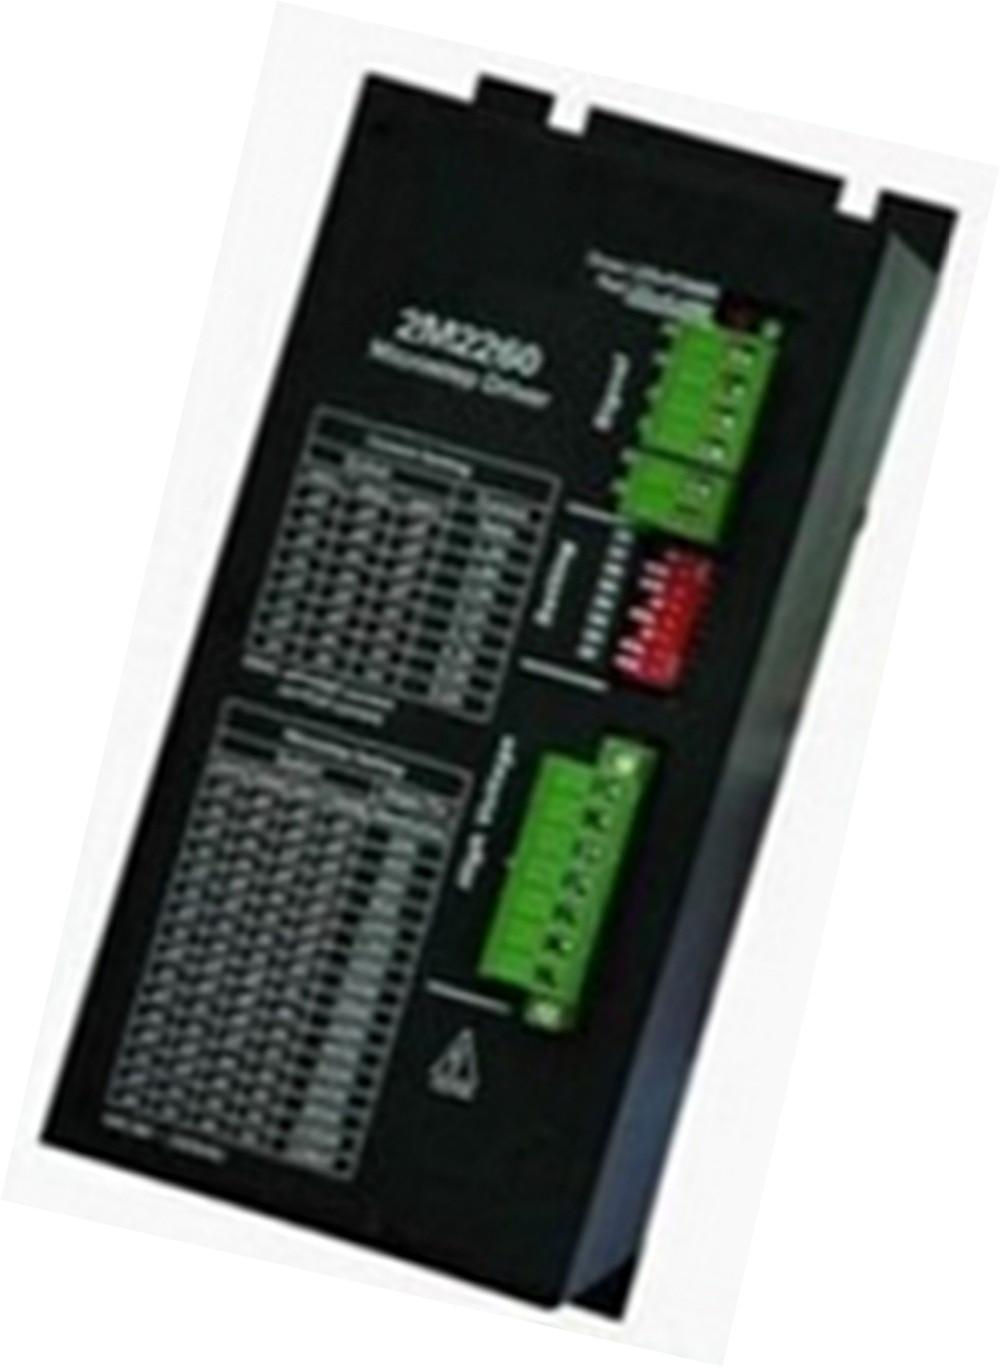 Original 86110130 two-phase stepper motor dri ver 2m2260 warranty for 1 year new original xs7c1a1dbm8 xs7c1a1dbm8c warranty for two year